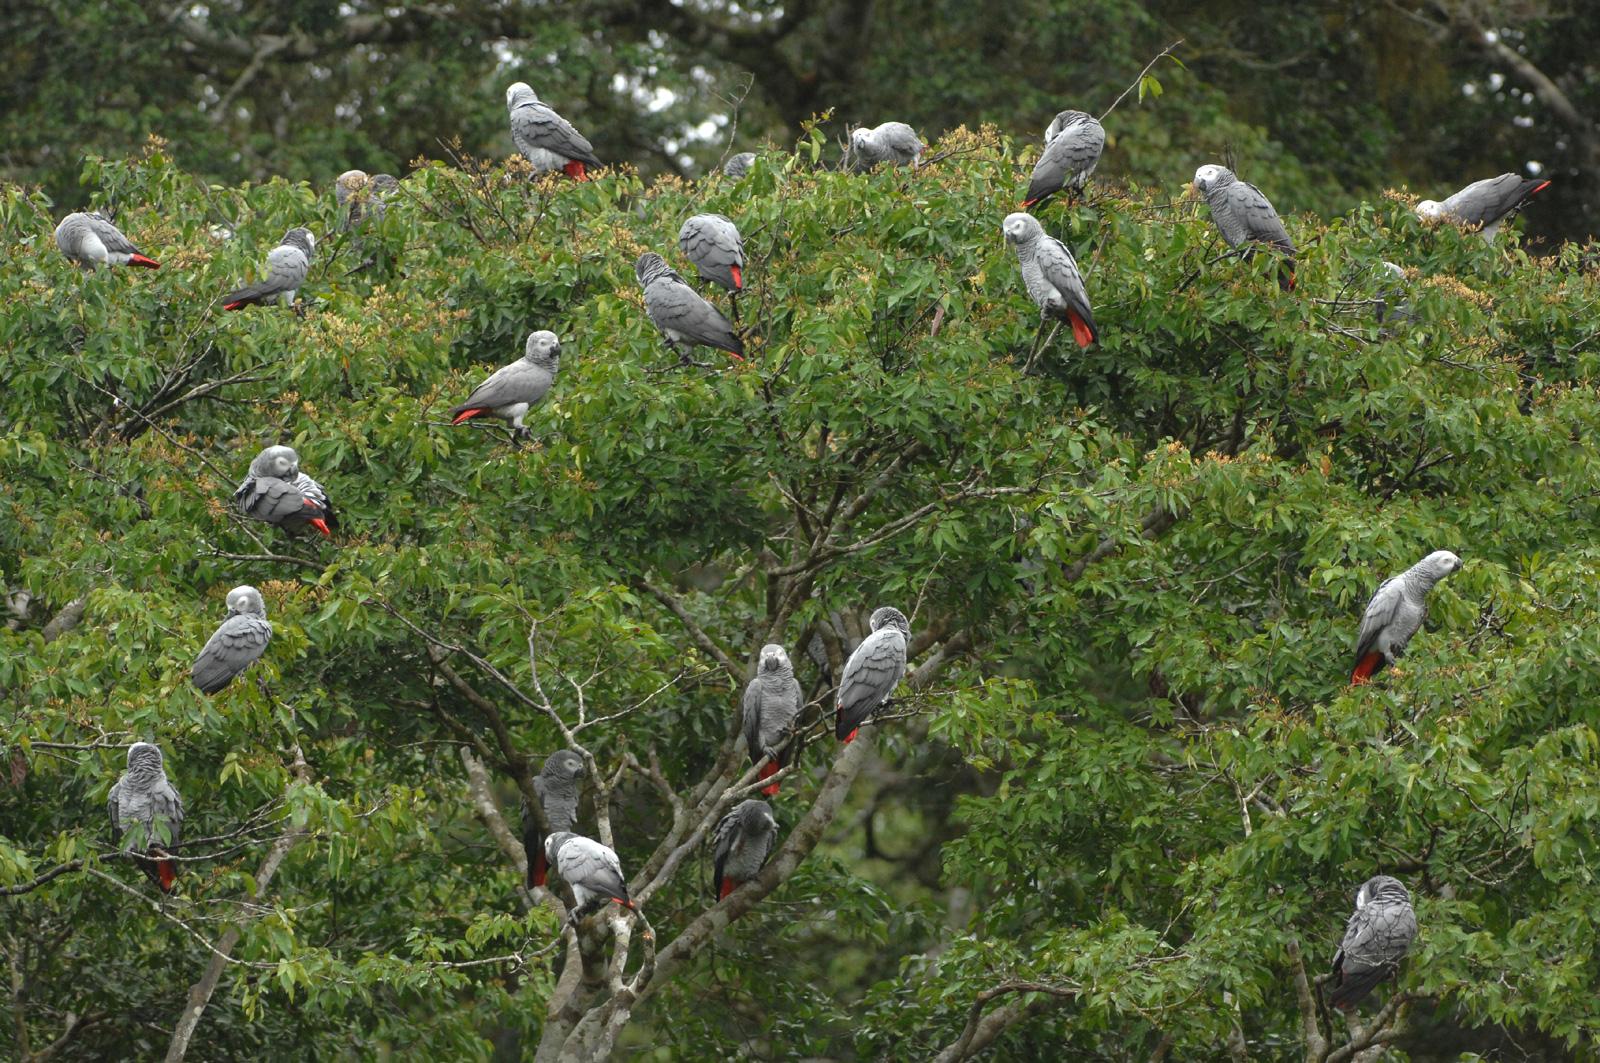 grey-parrots-shadws-of-grey-2